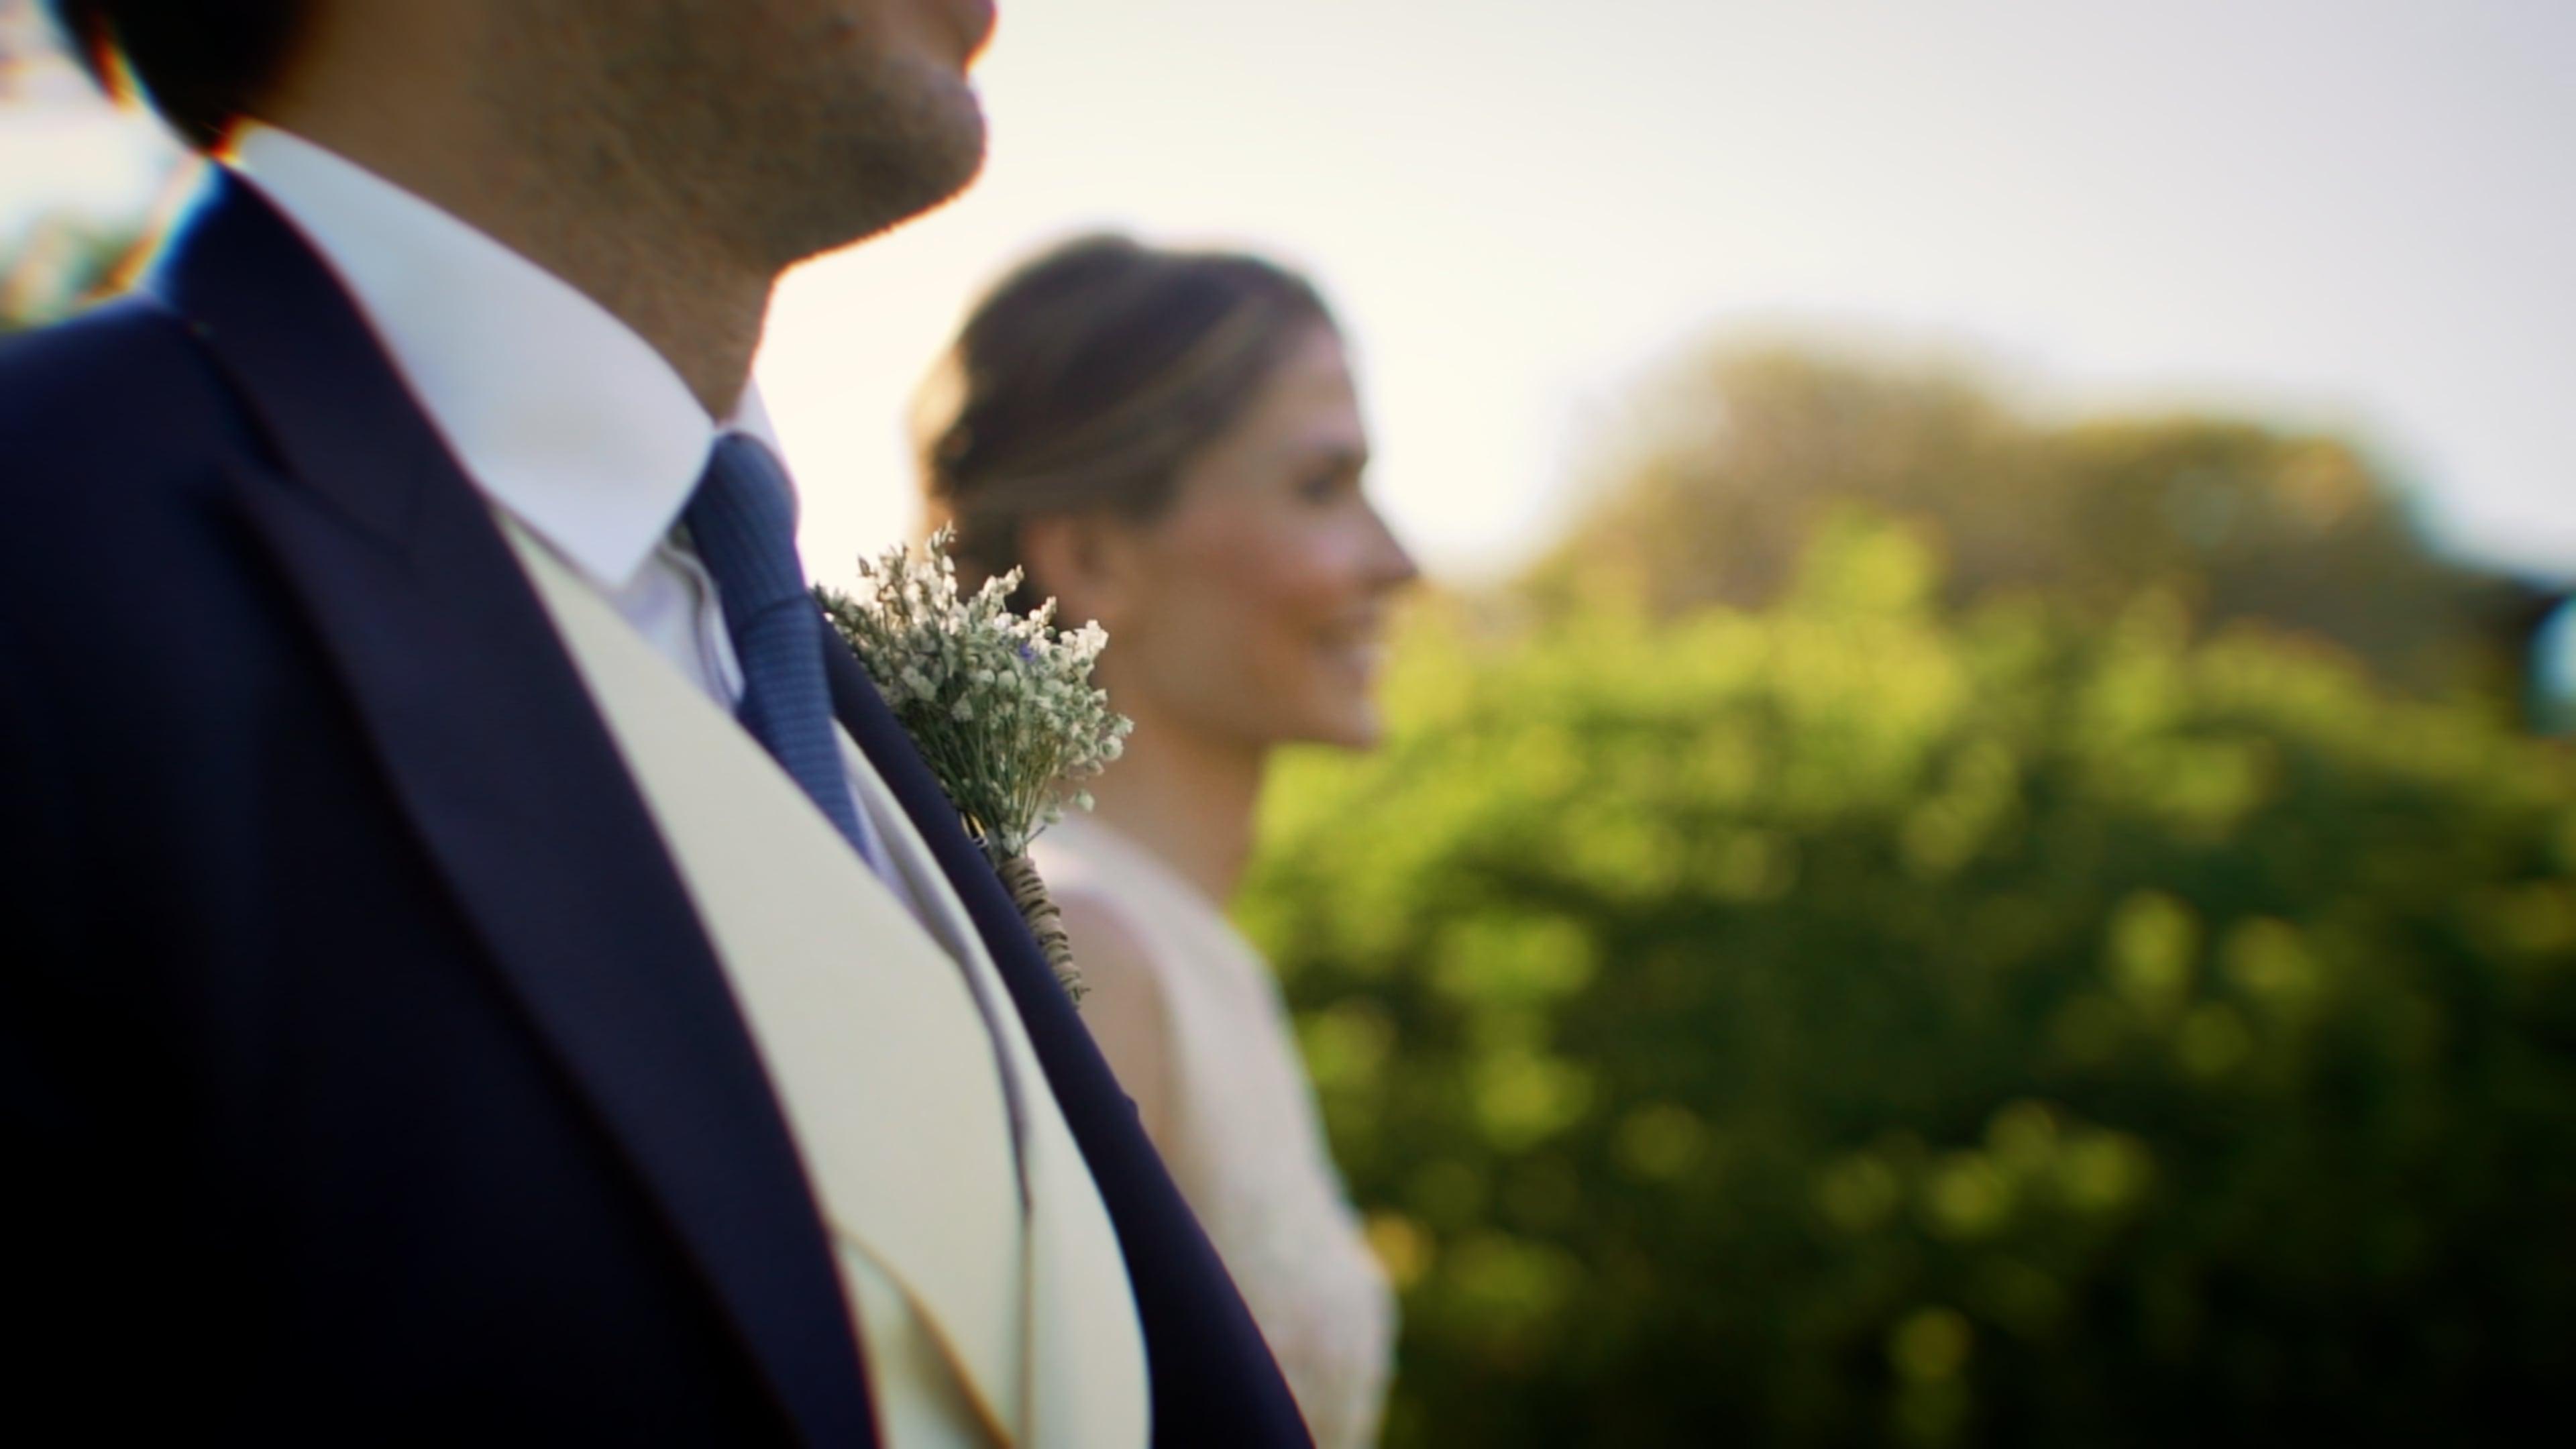 Vidéo de mariage Bonifacio